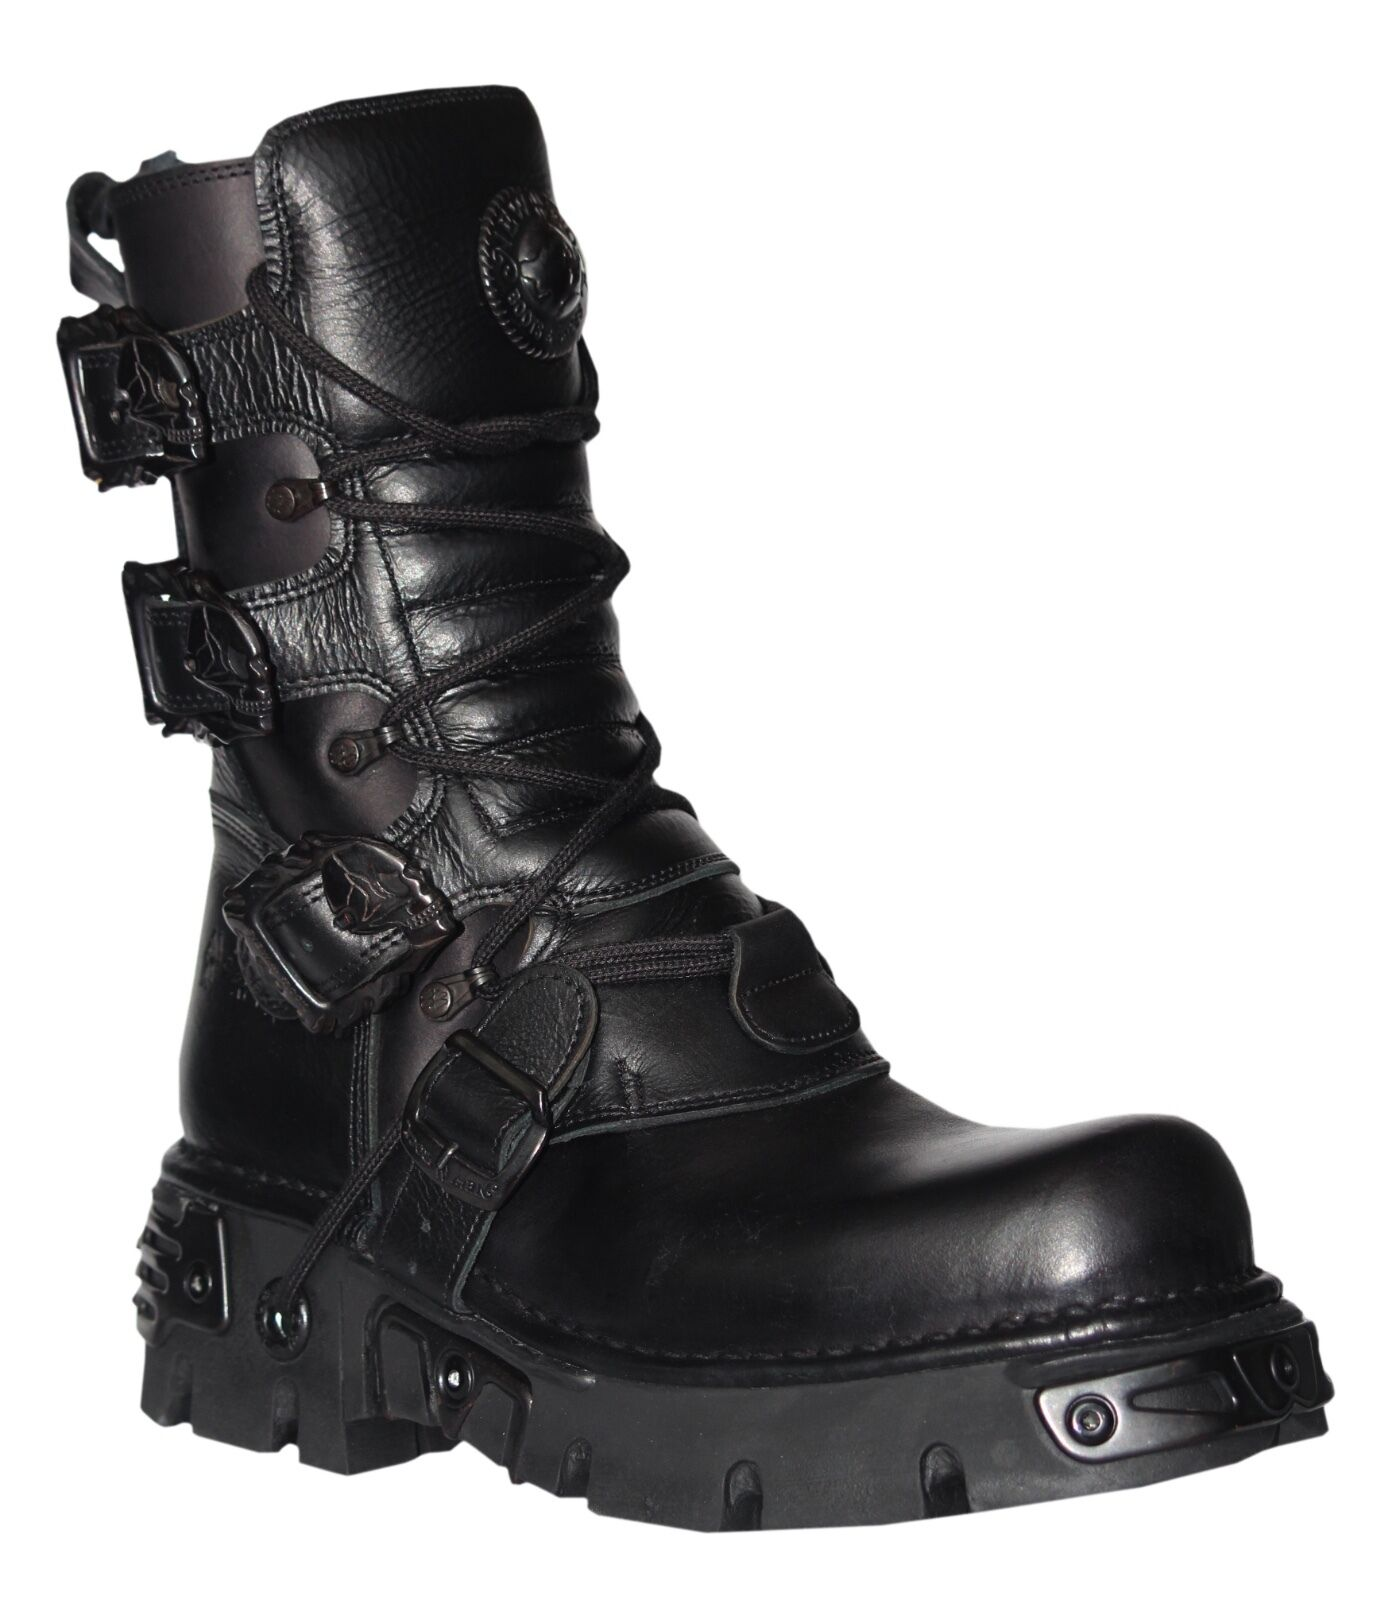 New Rock Unisex Black Metallic Reactor Punk Goth Biker Unisex Boots with Laces